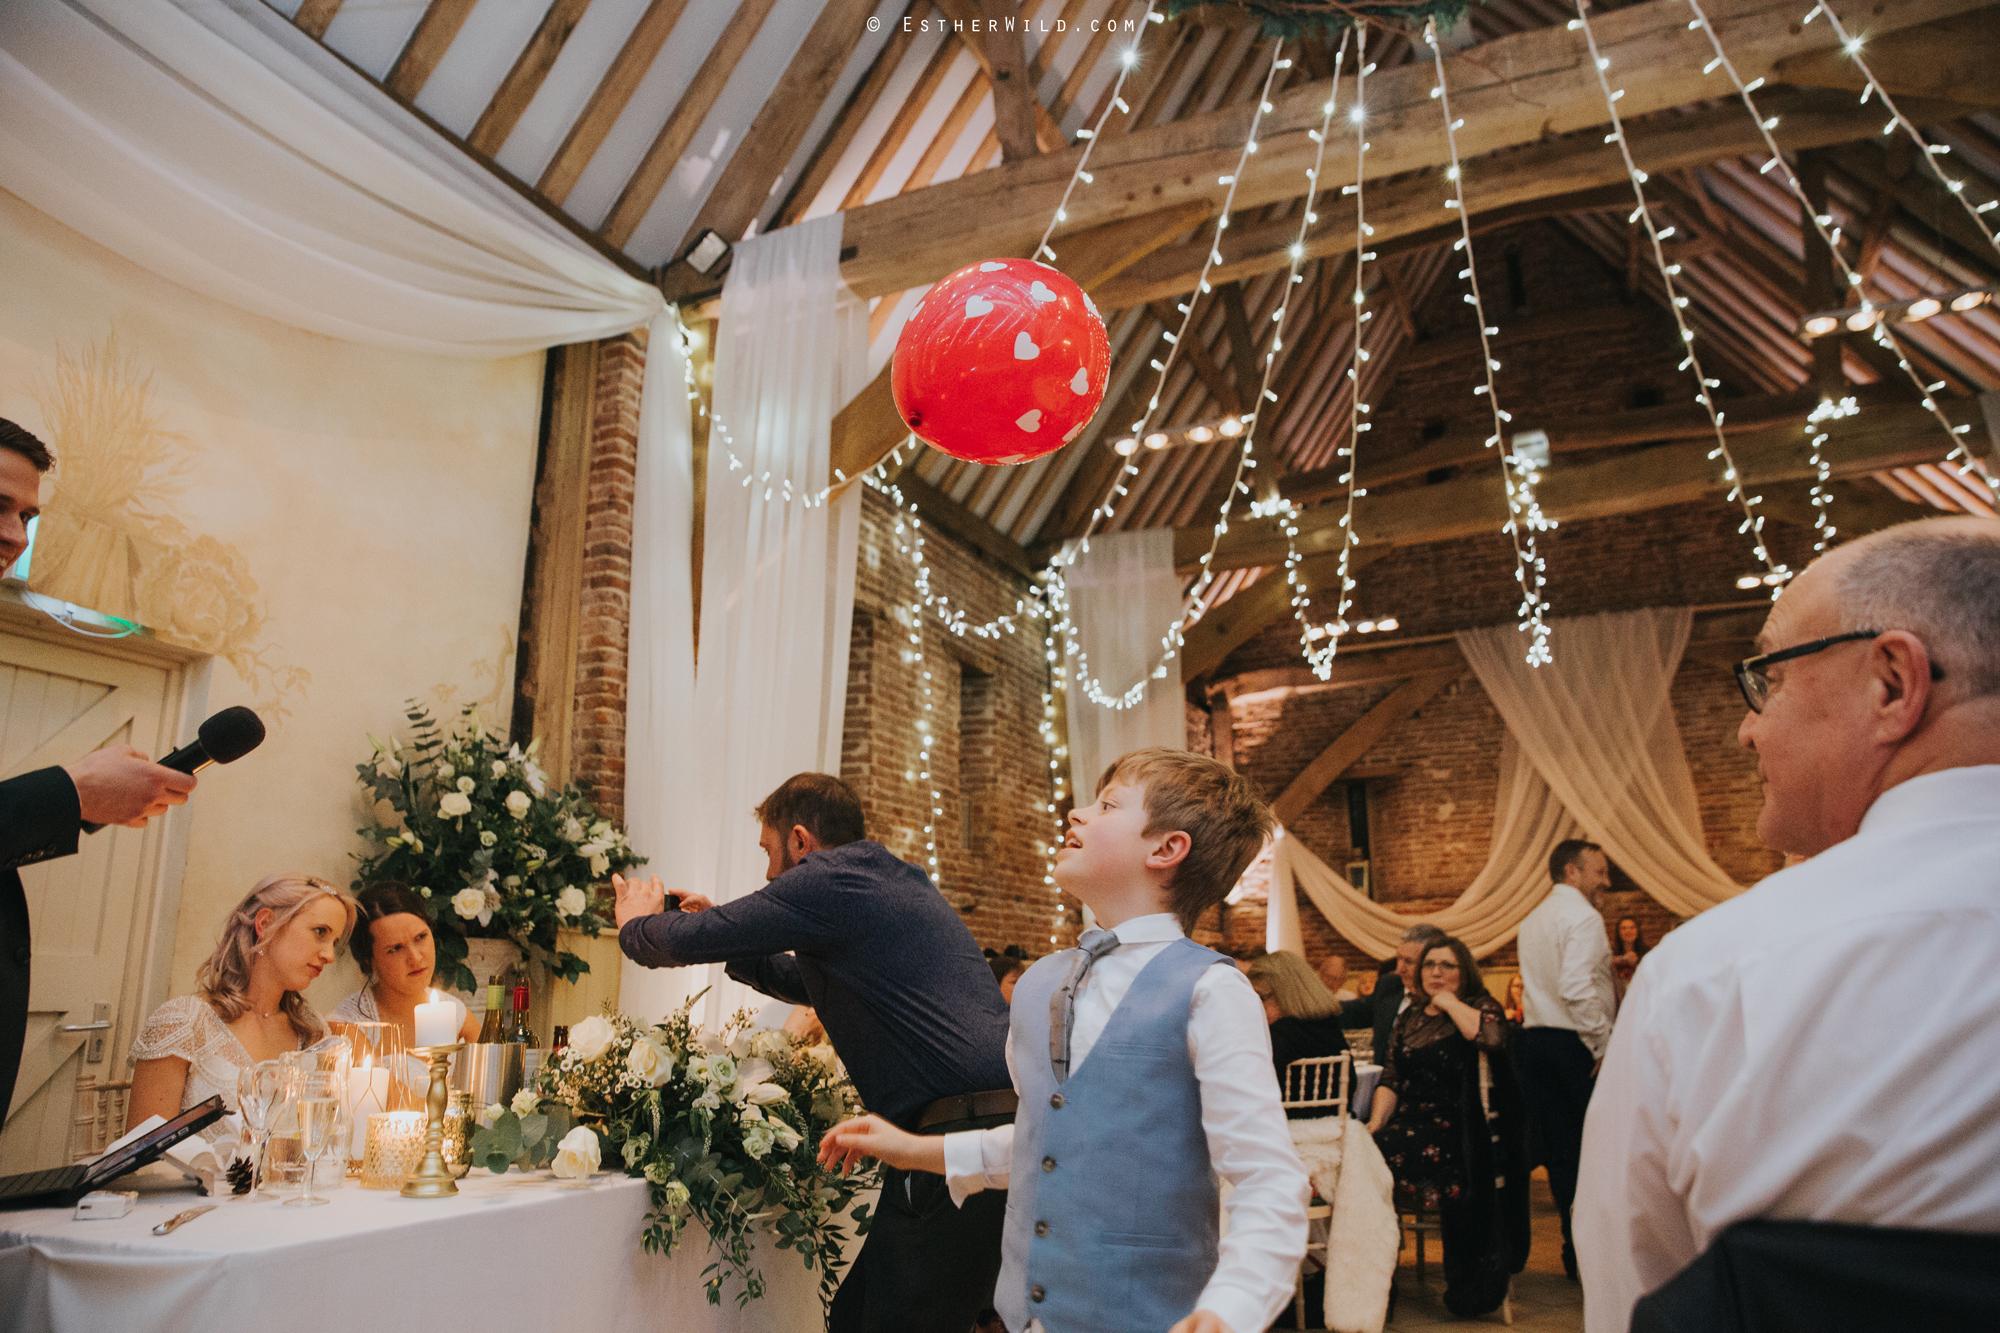 Elms_Barn_Weddings_Suffolk_Photographer_Copyright_Esther_Wild_IMG_2493.jpg